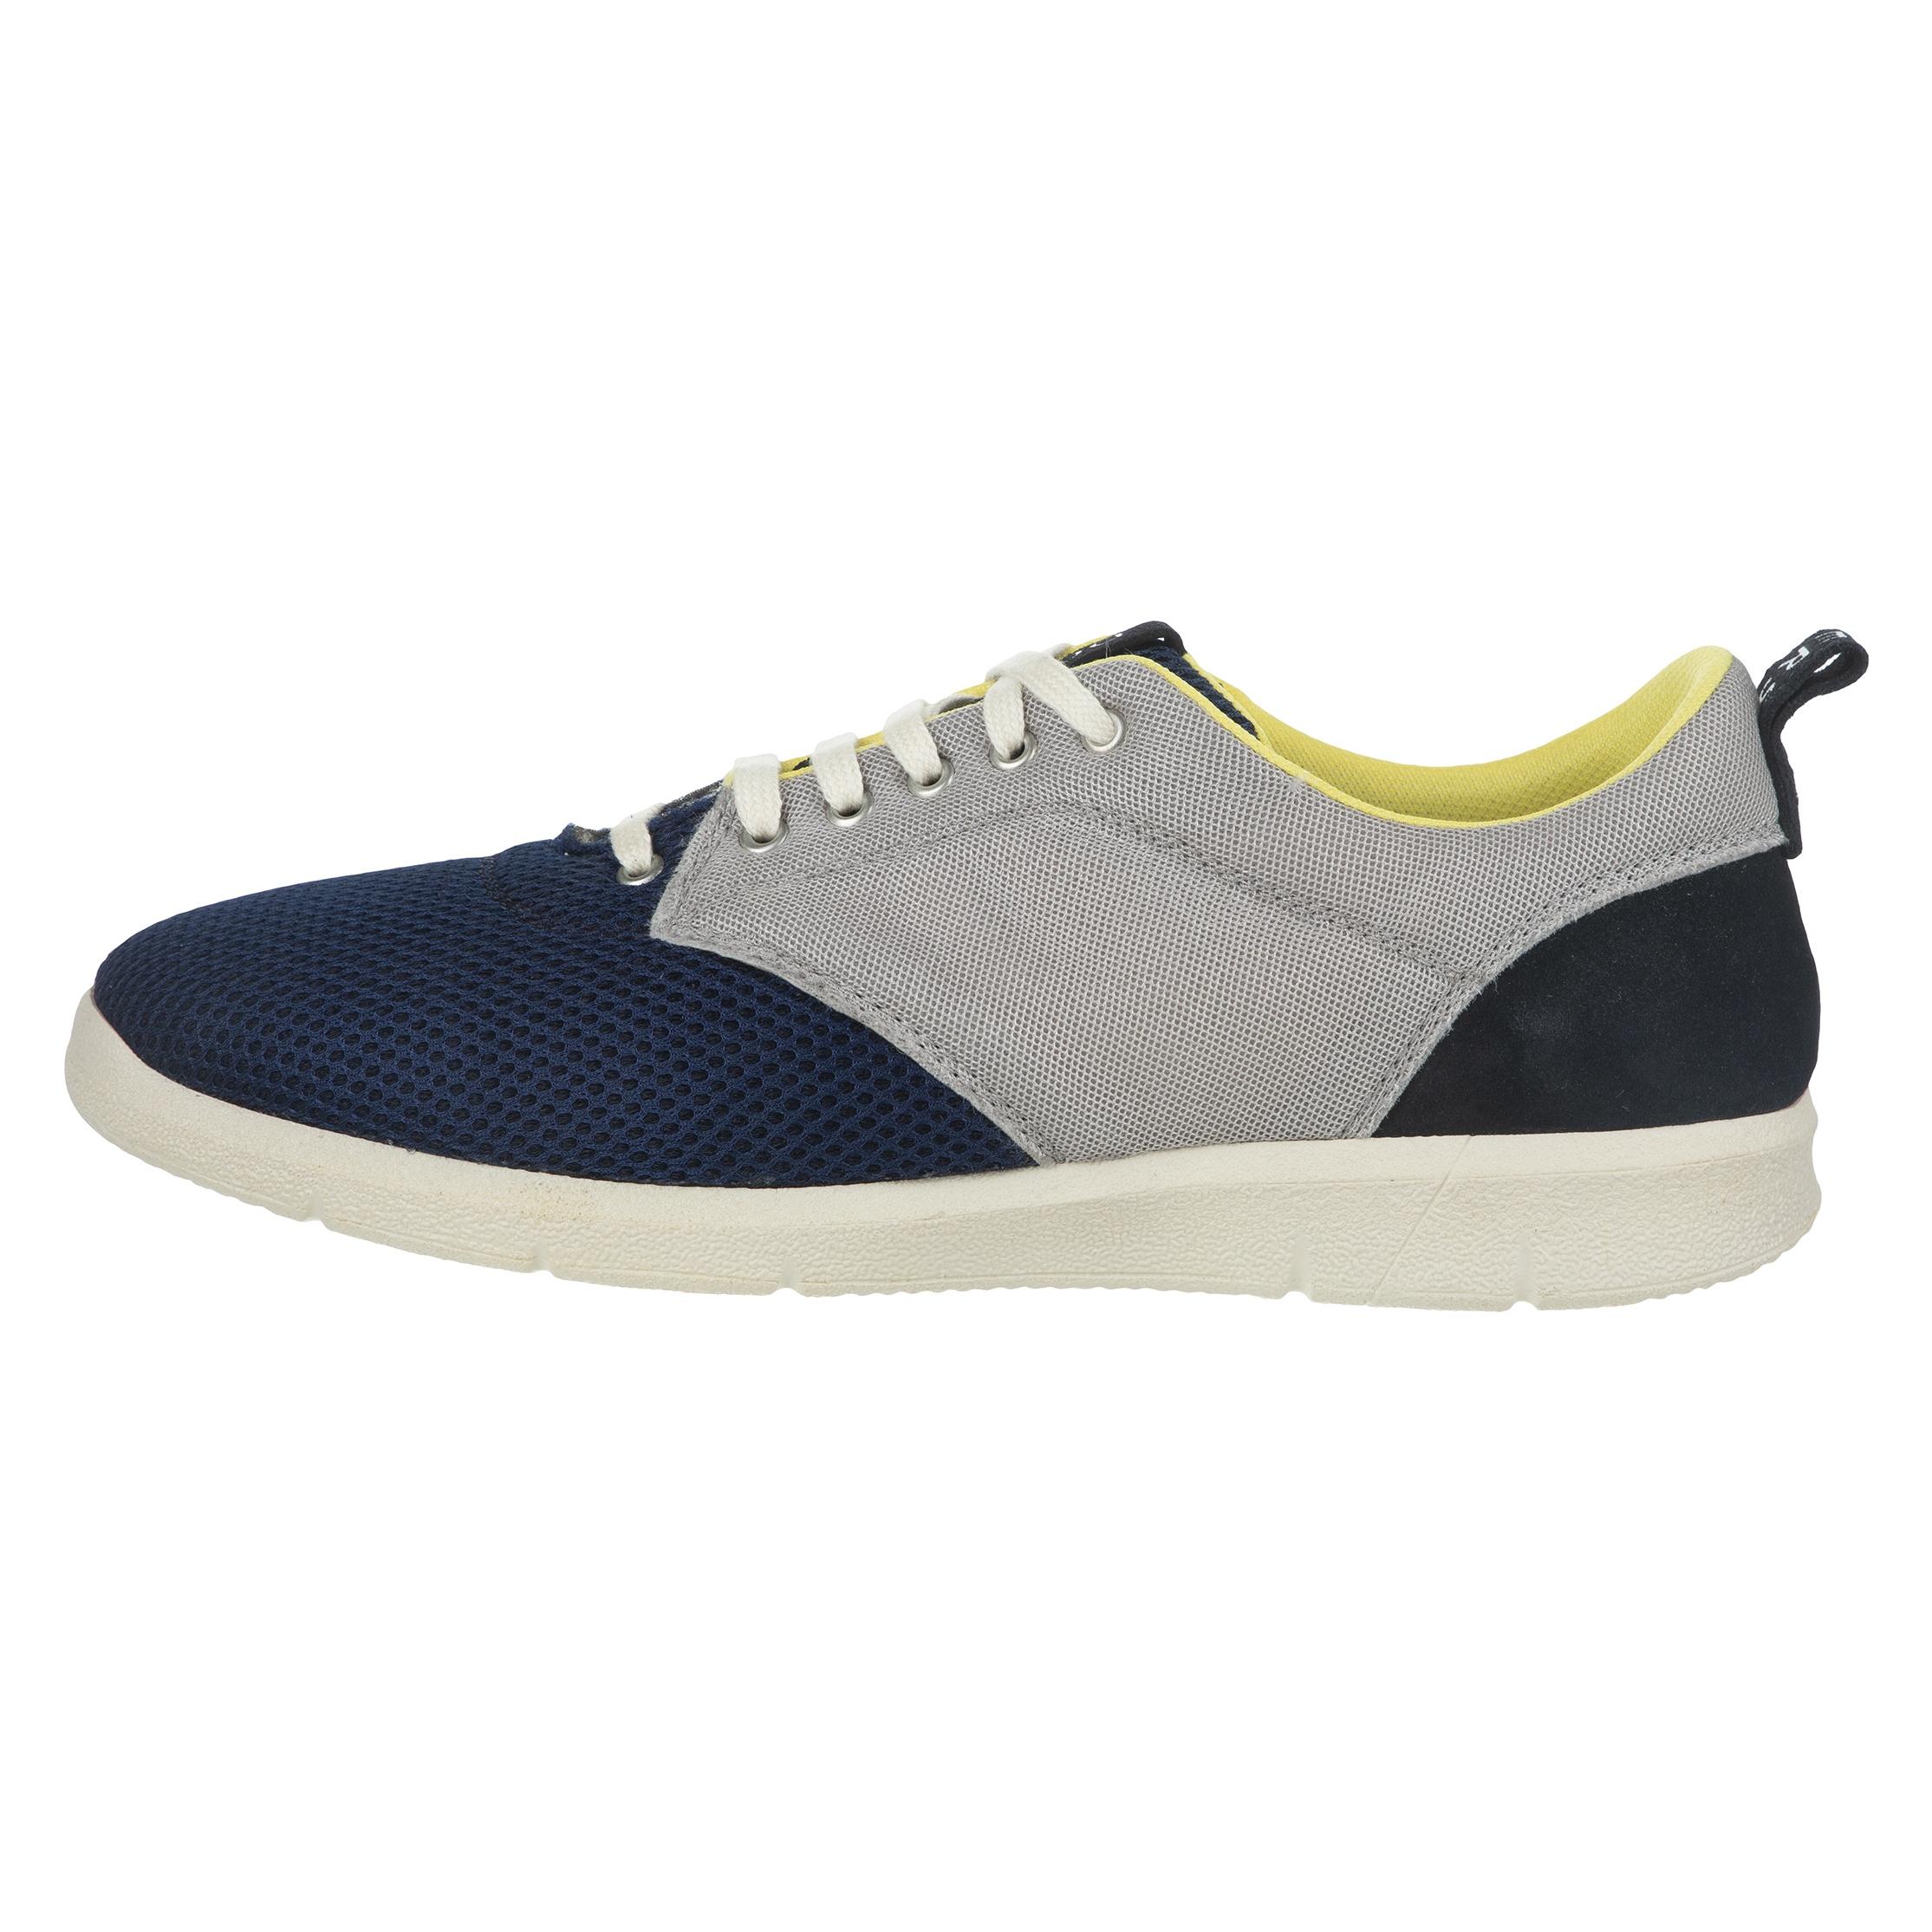 کفش روزمره مردانه داکرز مدل 100209331-101